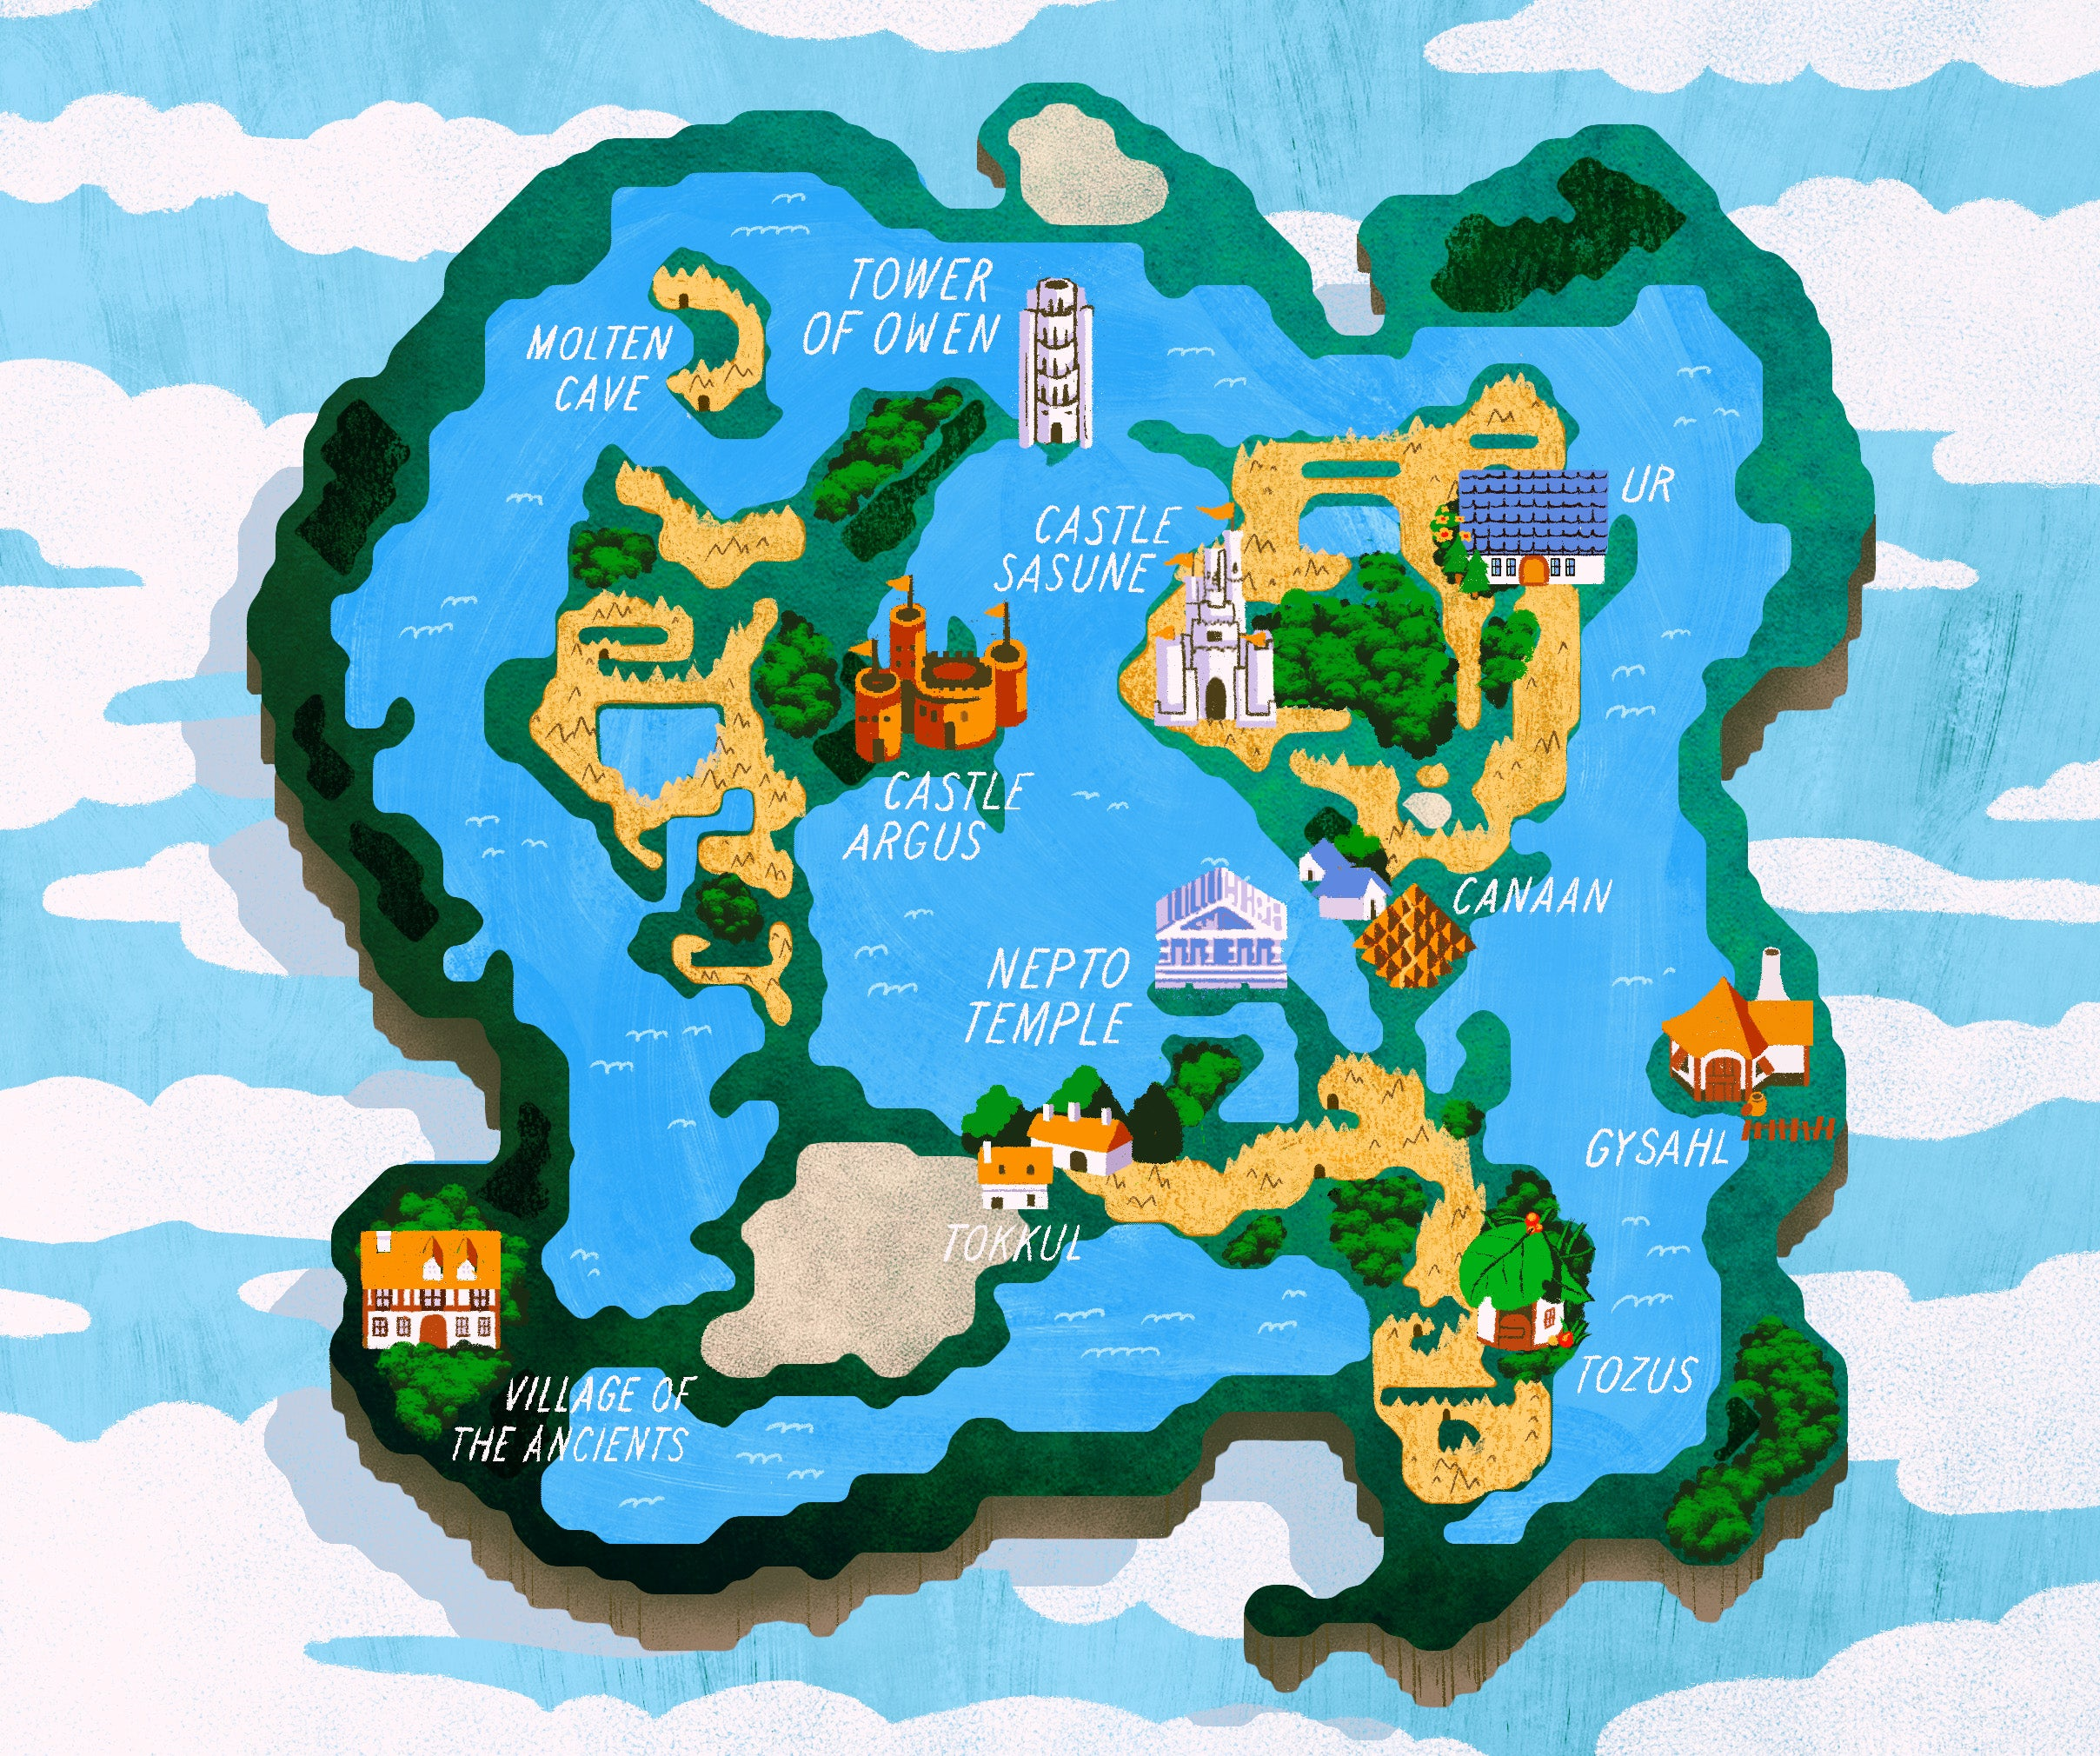 Final Fantasy III Retrospective: Hope You Like Losing Progress